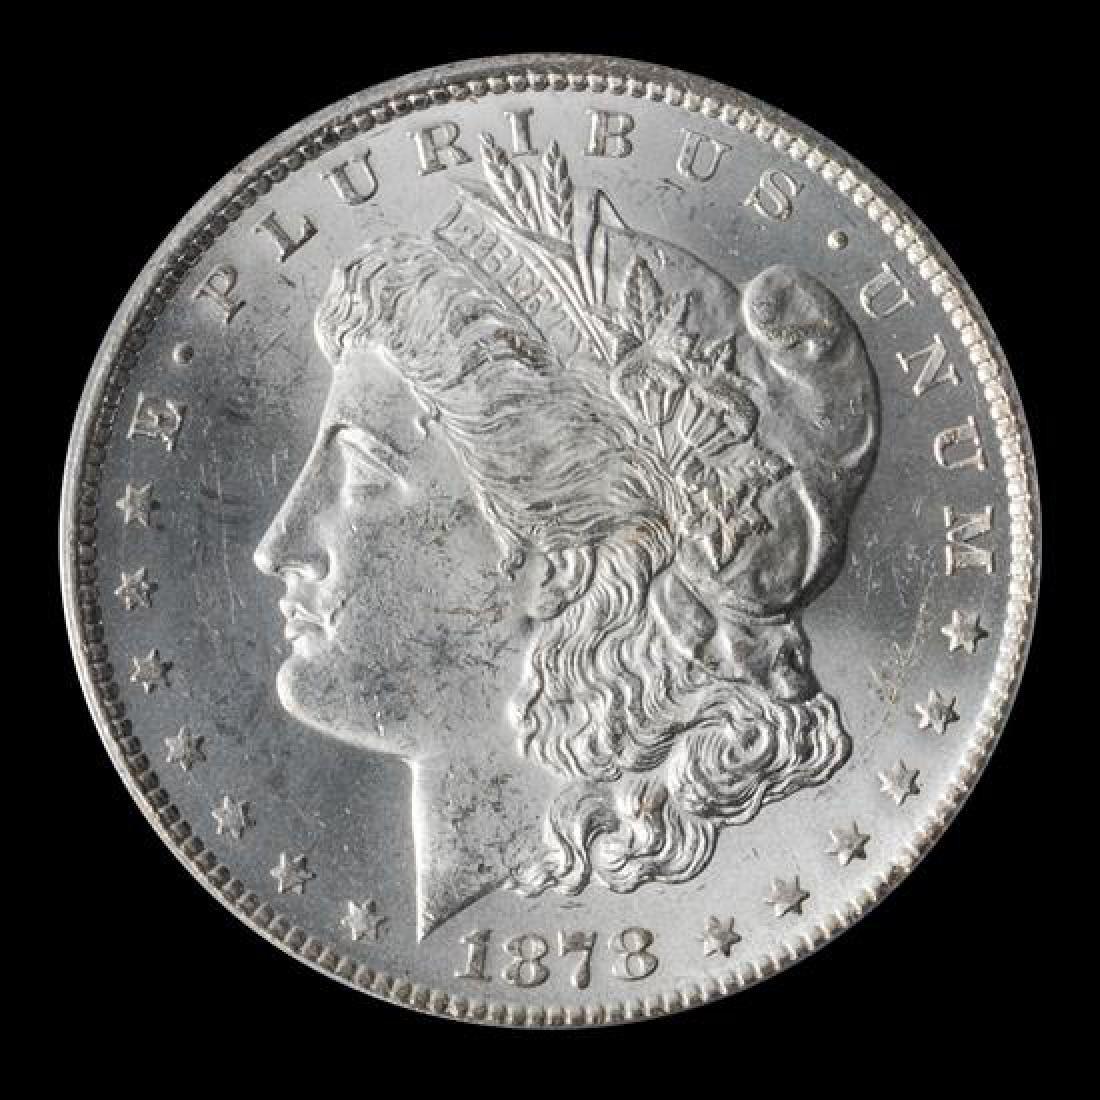 A United States 1878-CC Morgan Silver Dollar Coin